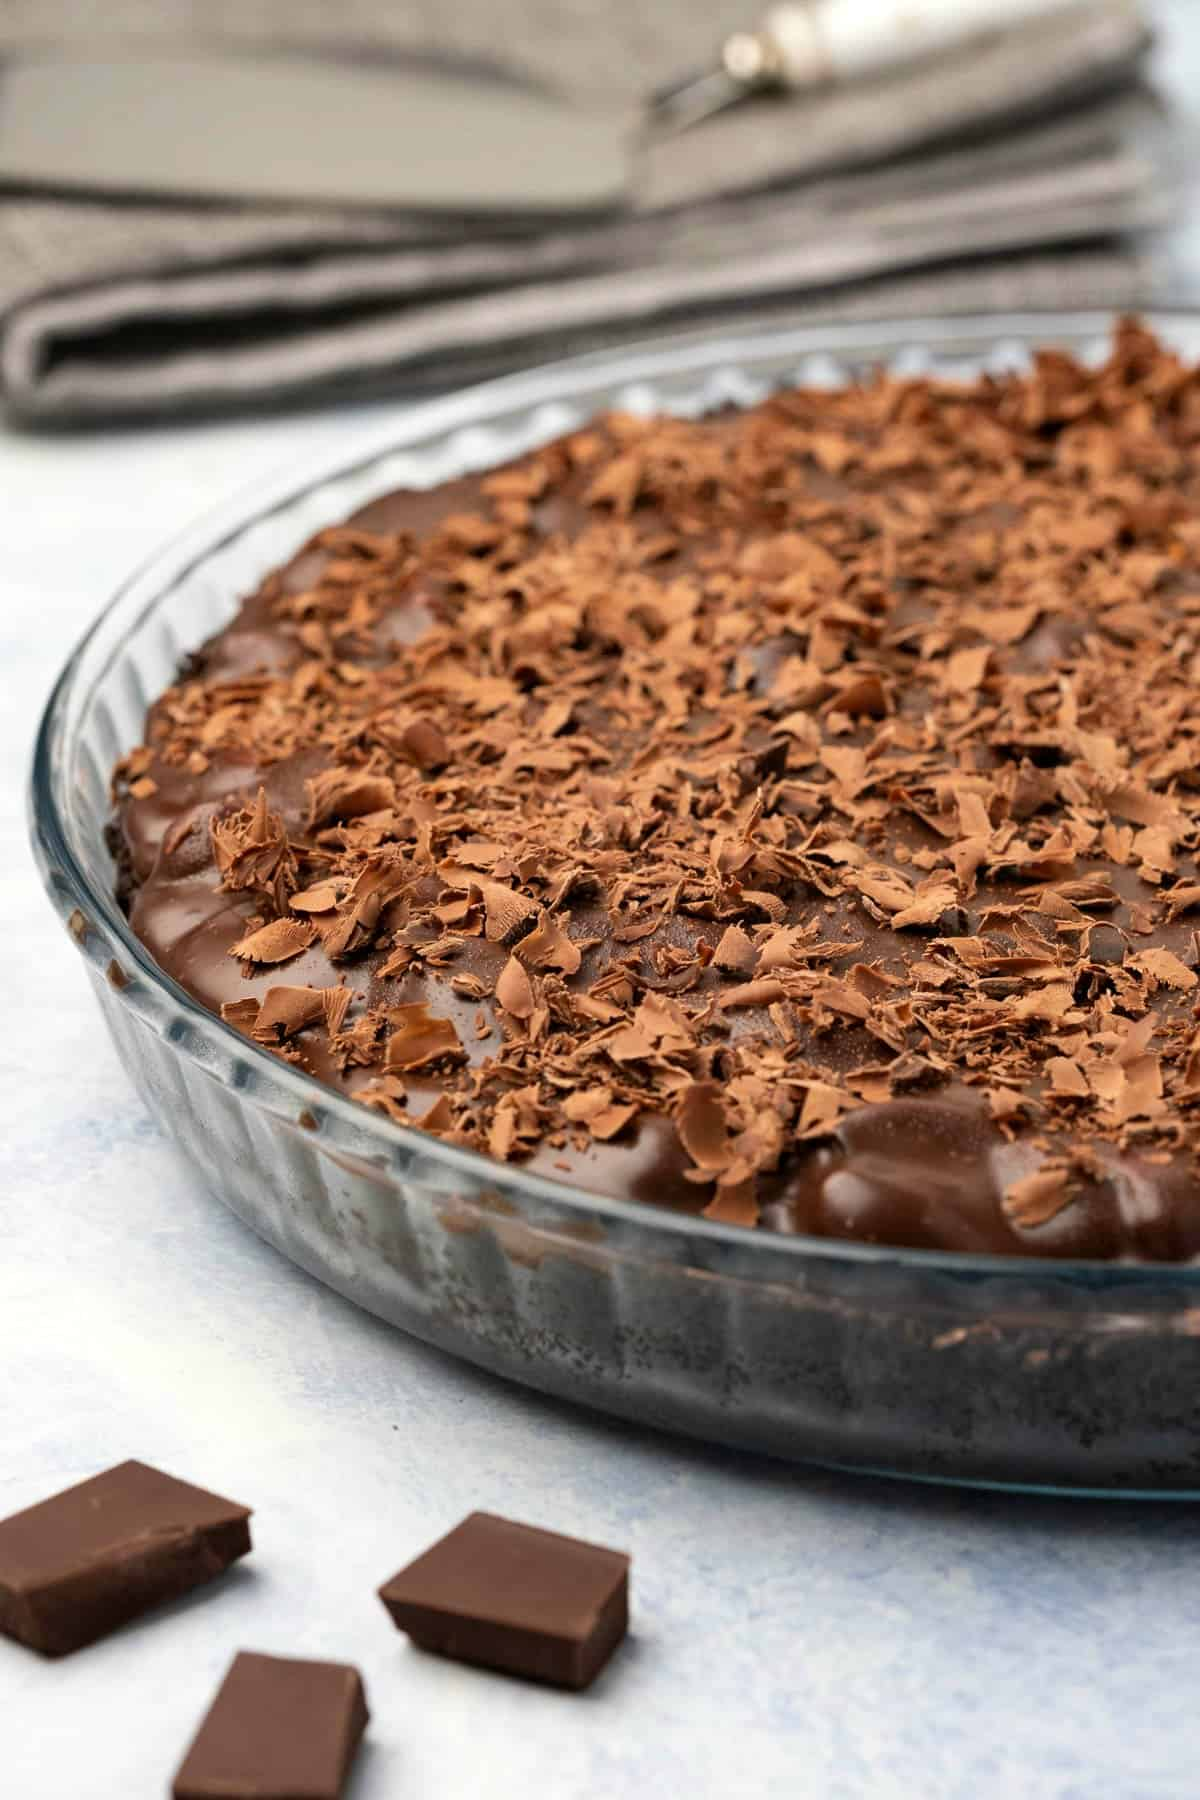 Chocolate tart in a glass dish.